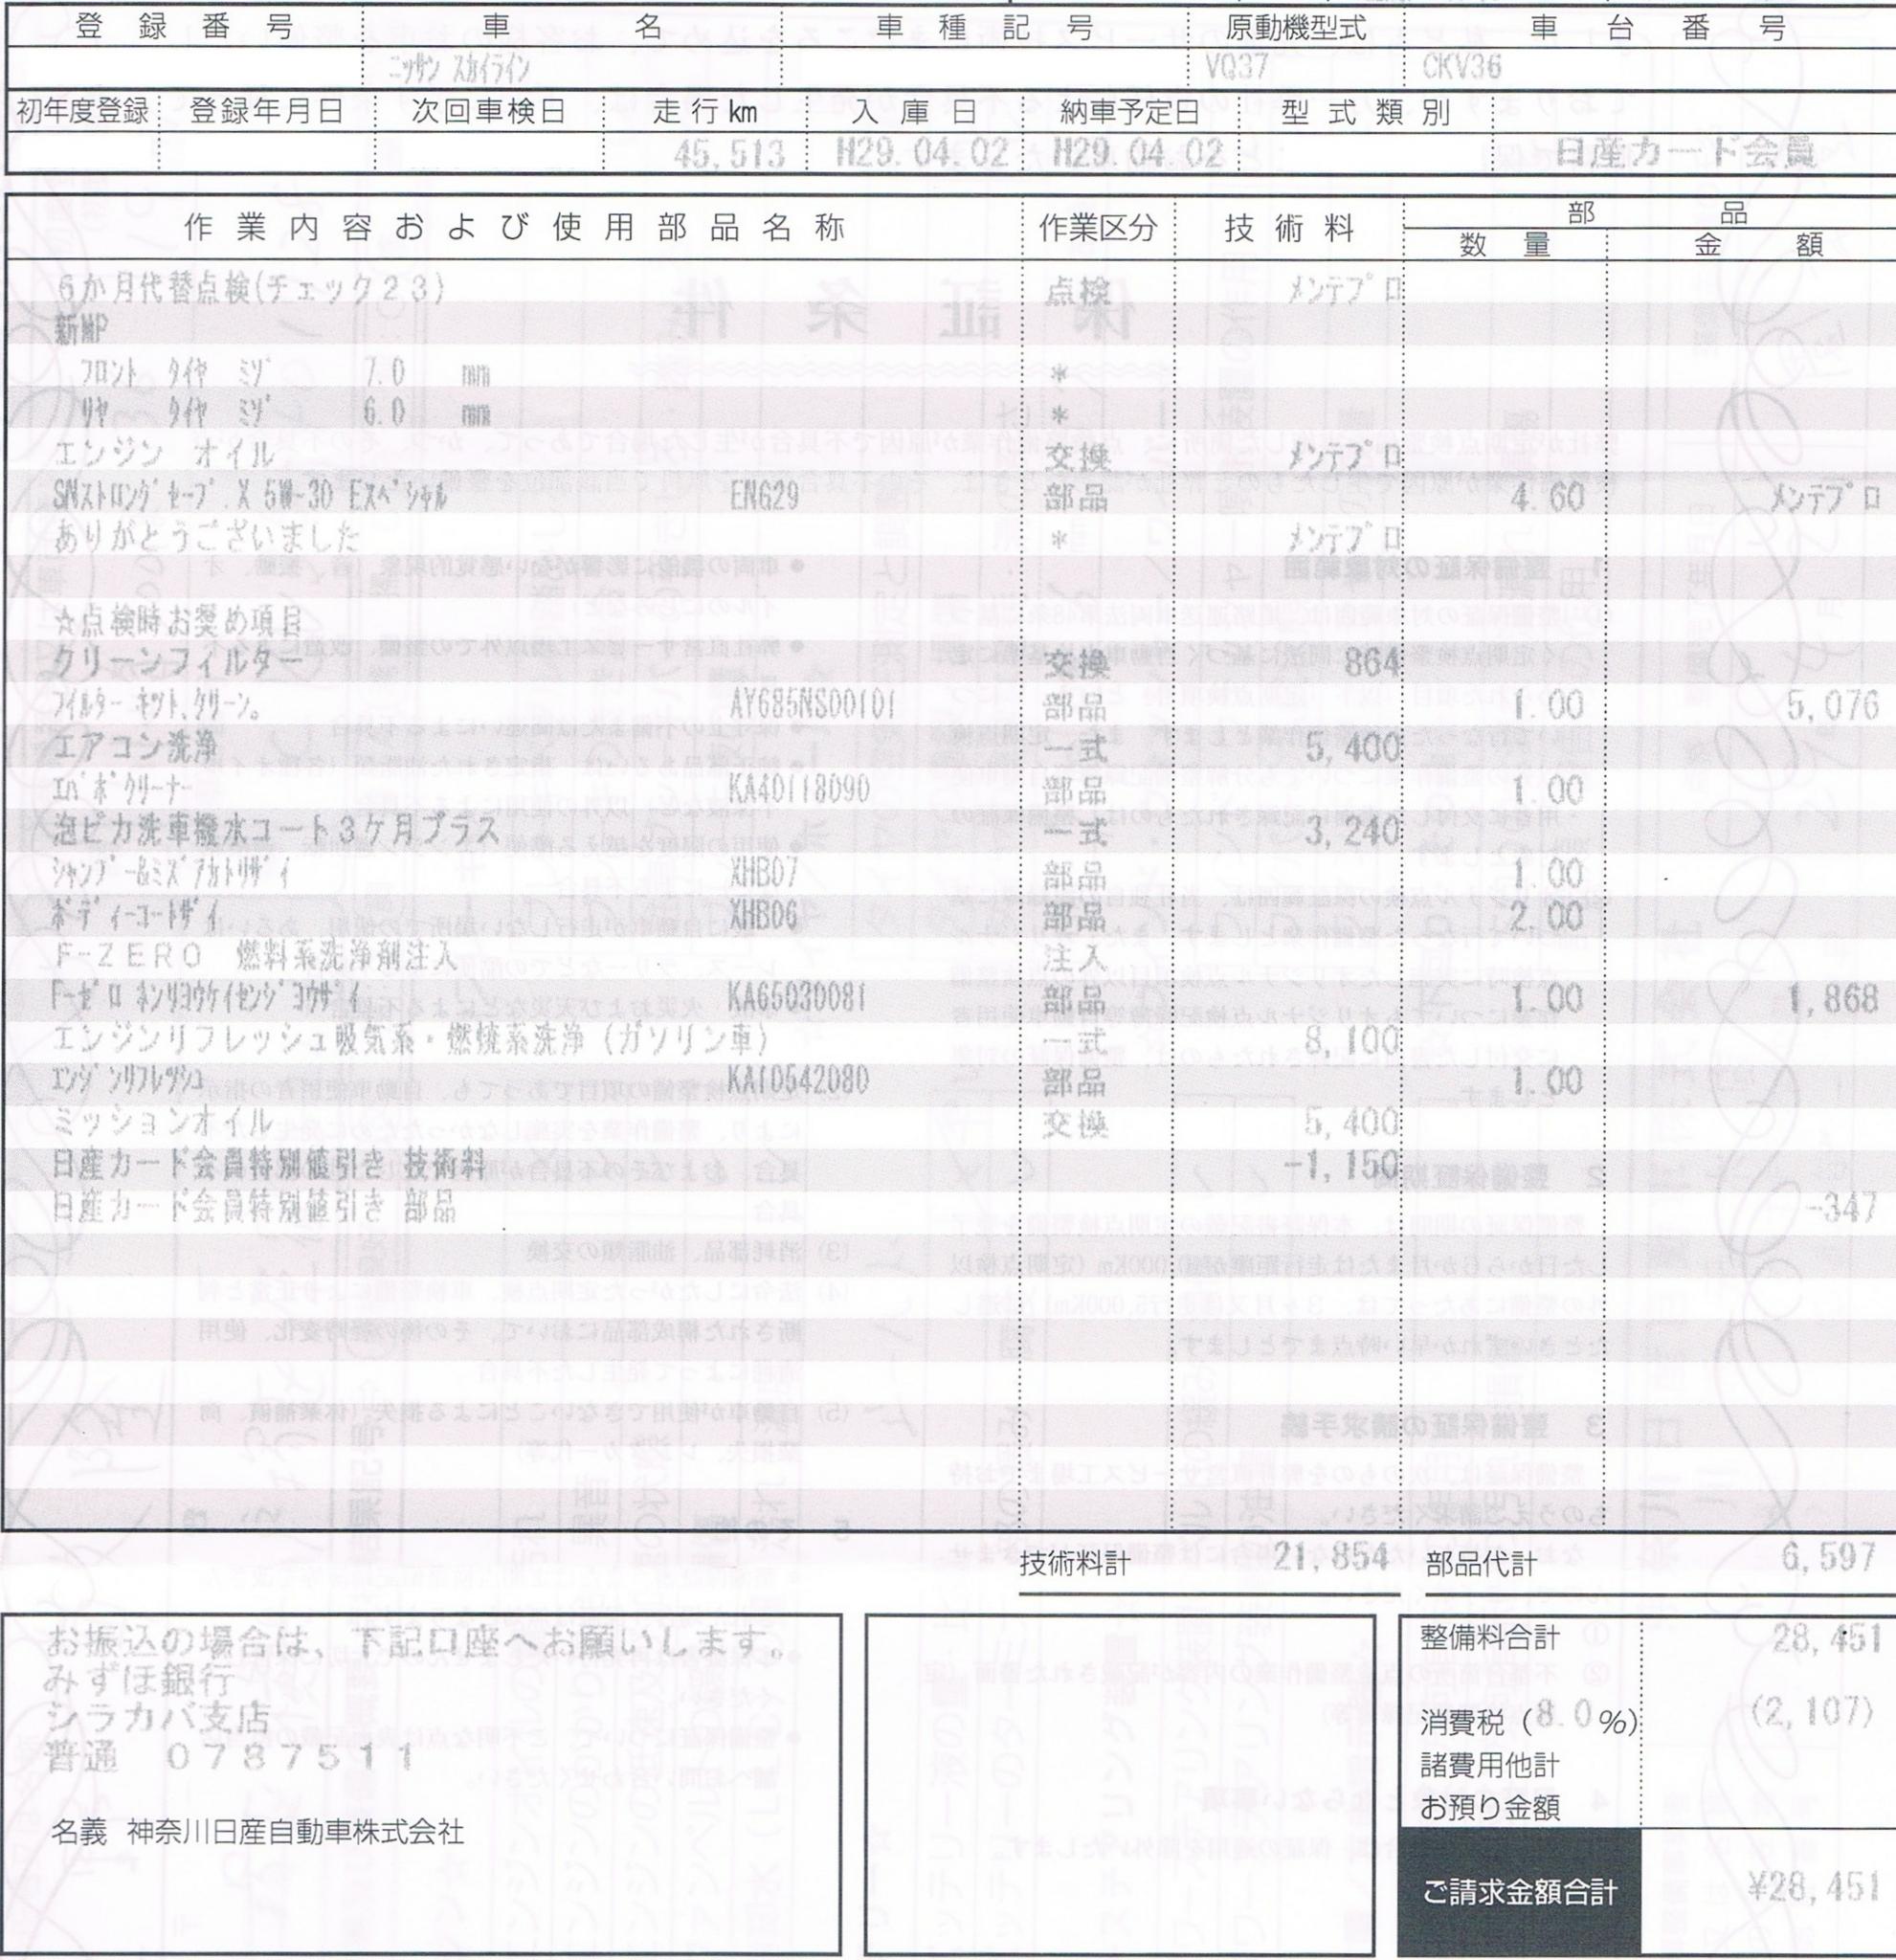 f:id:ToshUeno:20170402203112j:plain